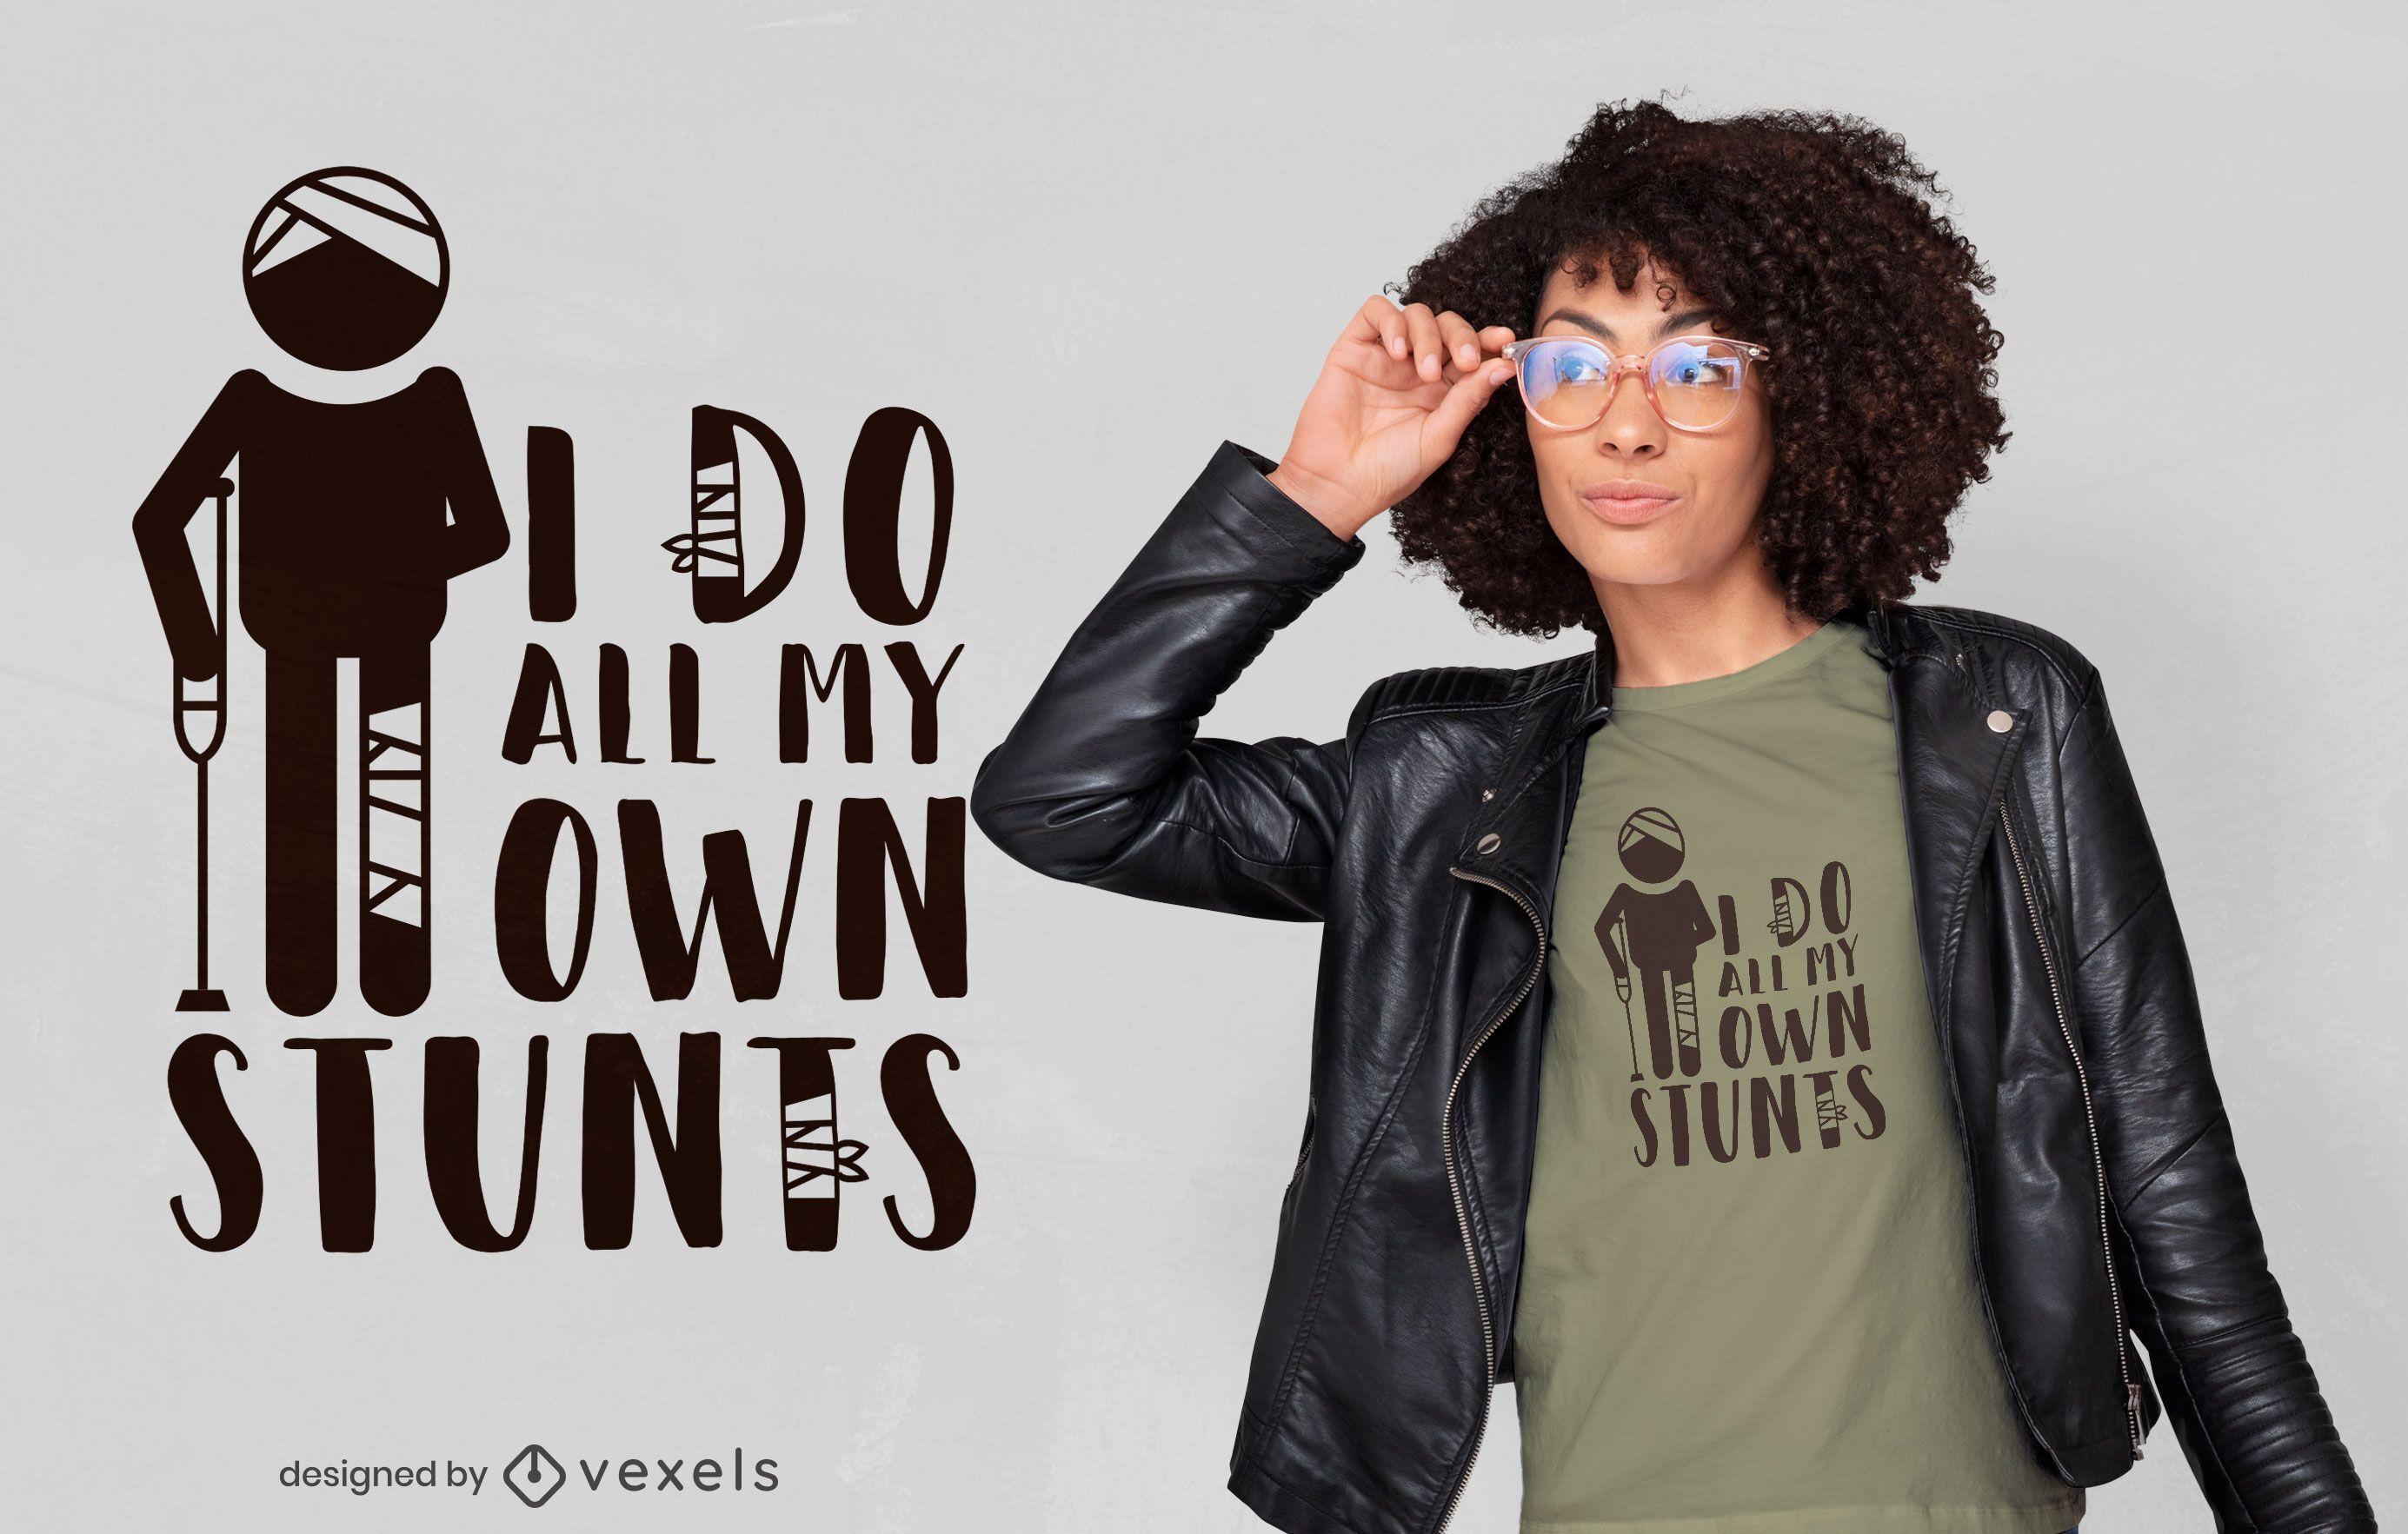 Stick figure stunt quote t-shirt design